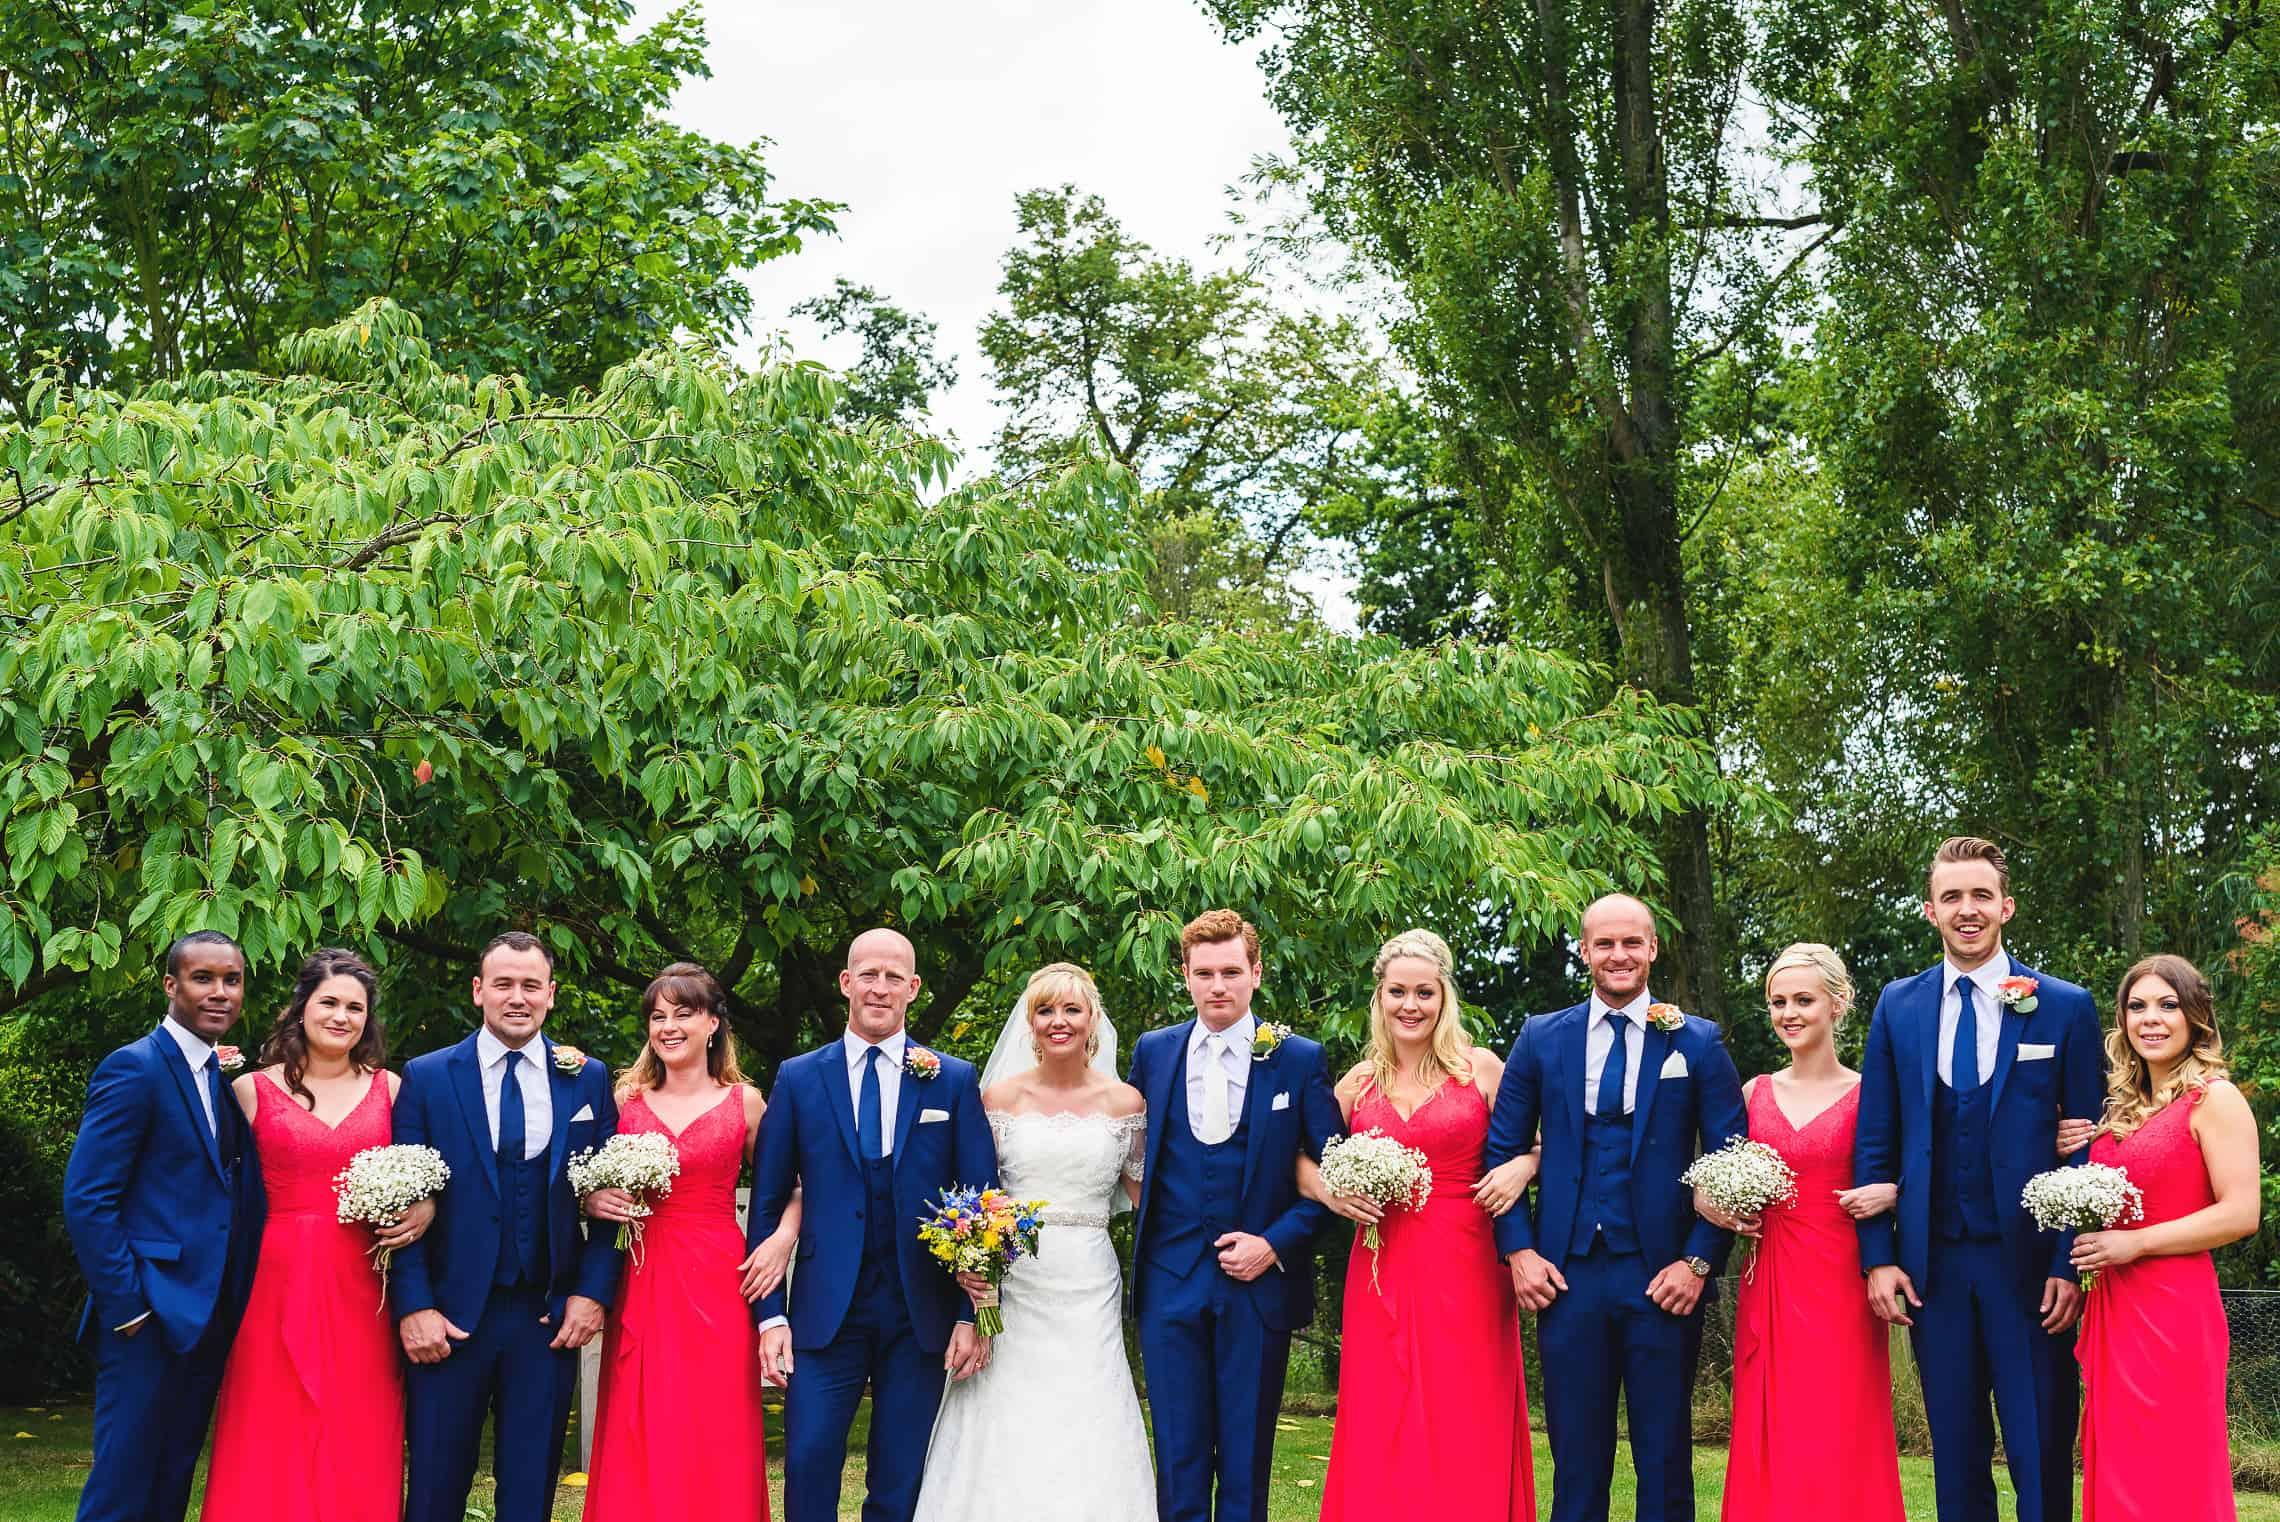 blake_hall_wedding_bc_justin_bailey_photography_029